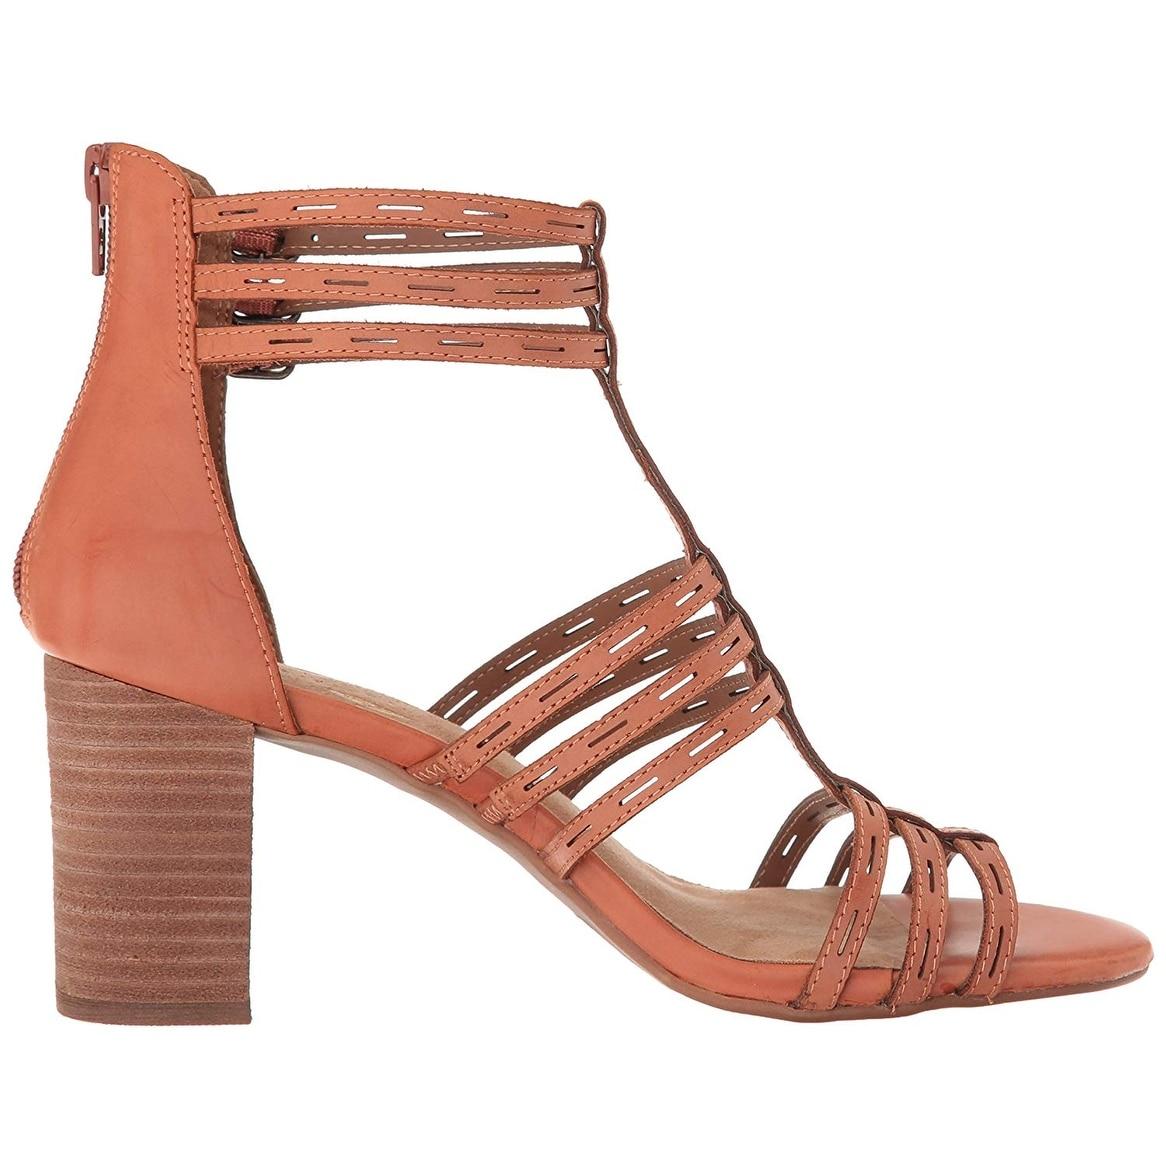 4d3f56533cdb Shop Aerosoles Women s Highway Dress Sandal - Free Shipping Today -  Overstock - 23504944